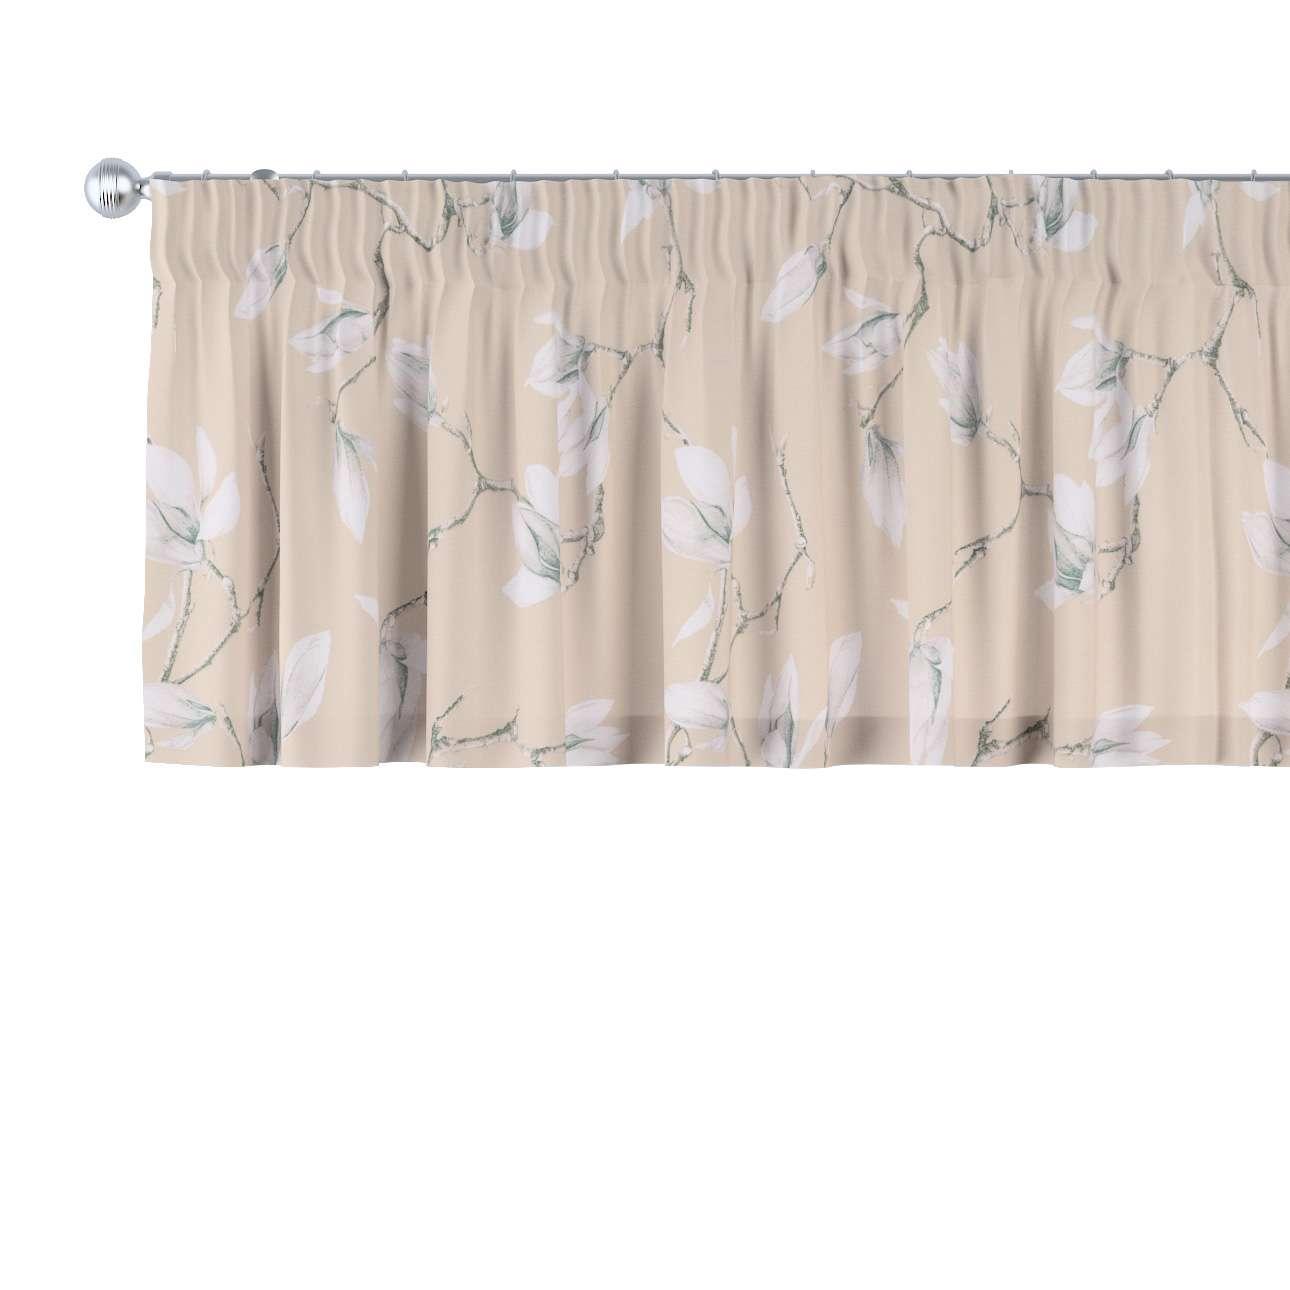 Gardinkappa med rynkband 130 x 40 cm i kollektionen Flowers, Tyg: 311-12